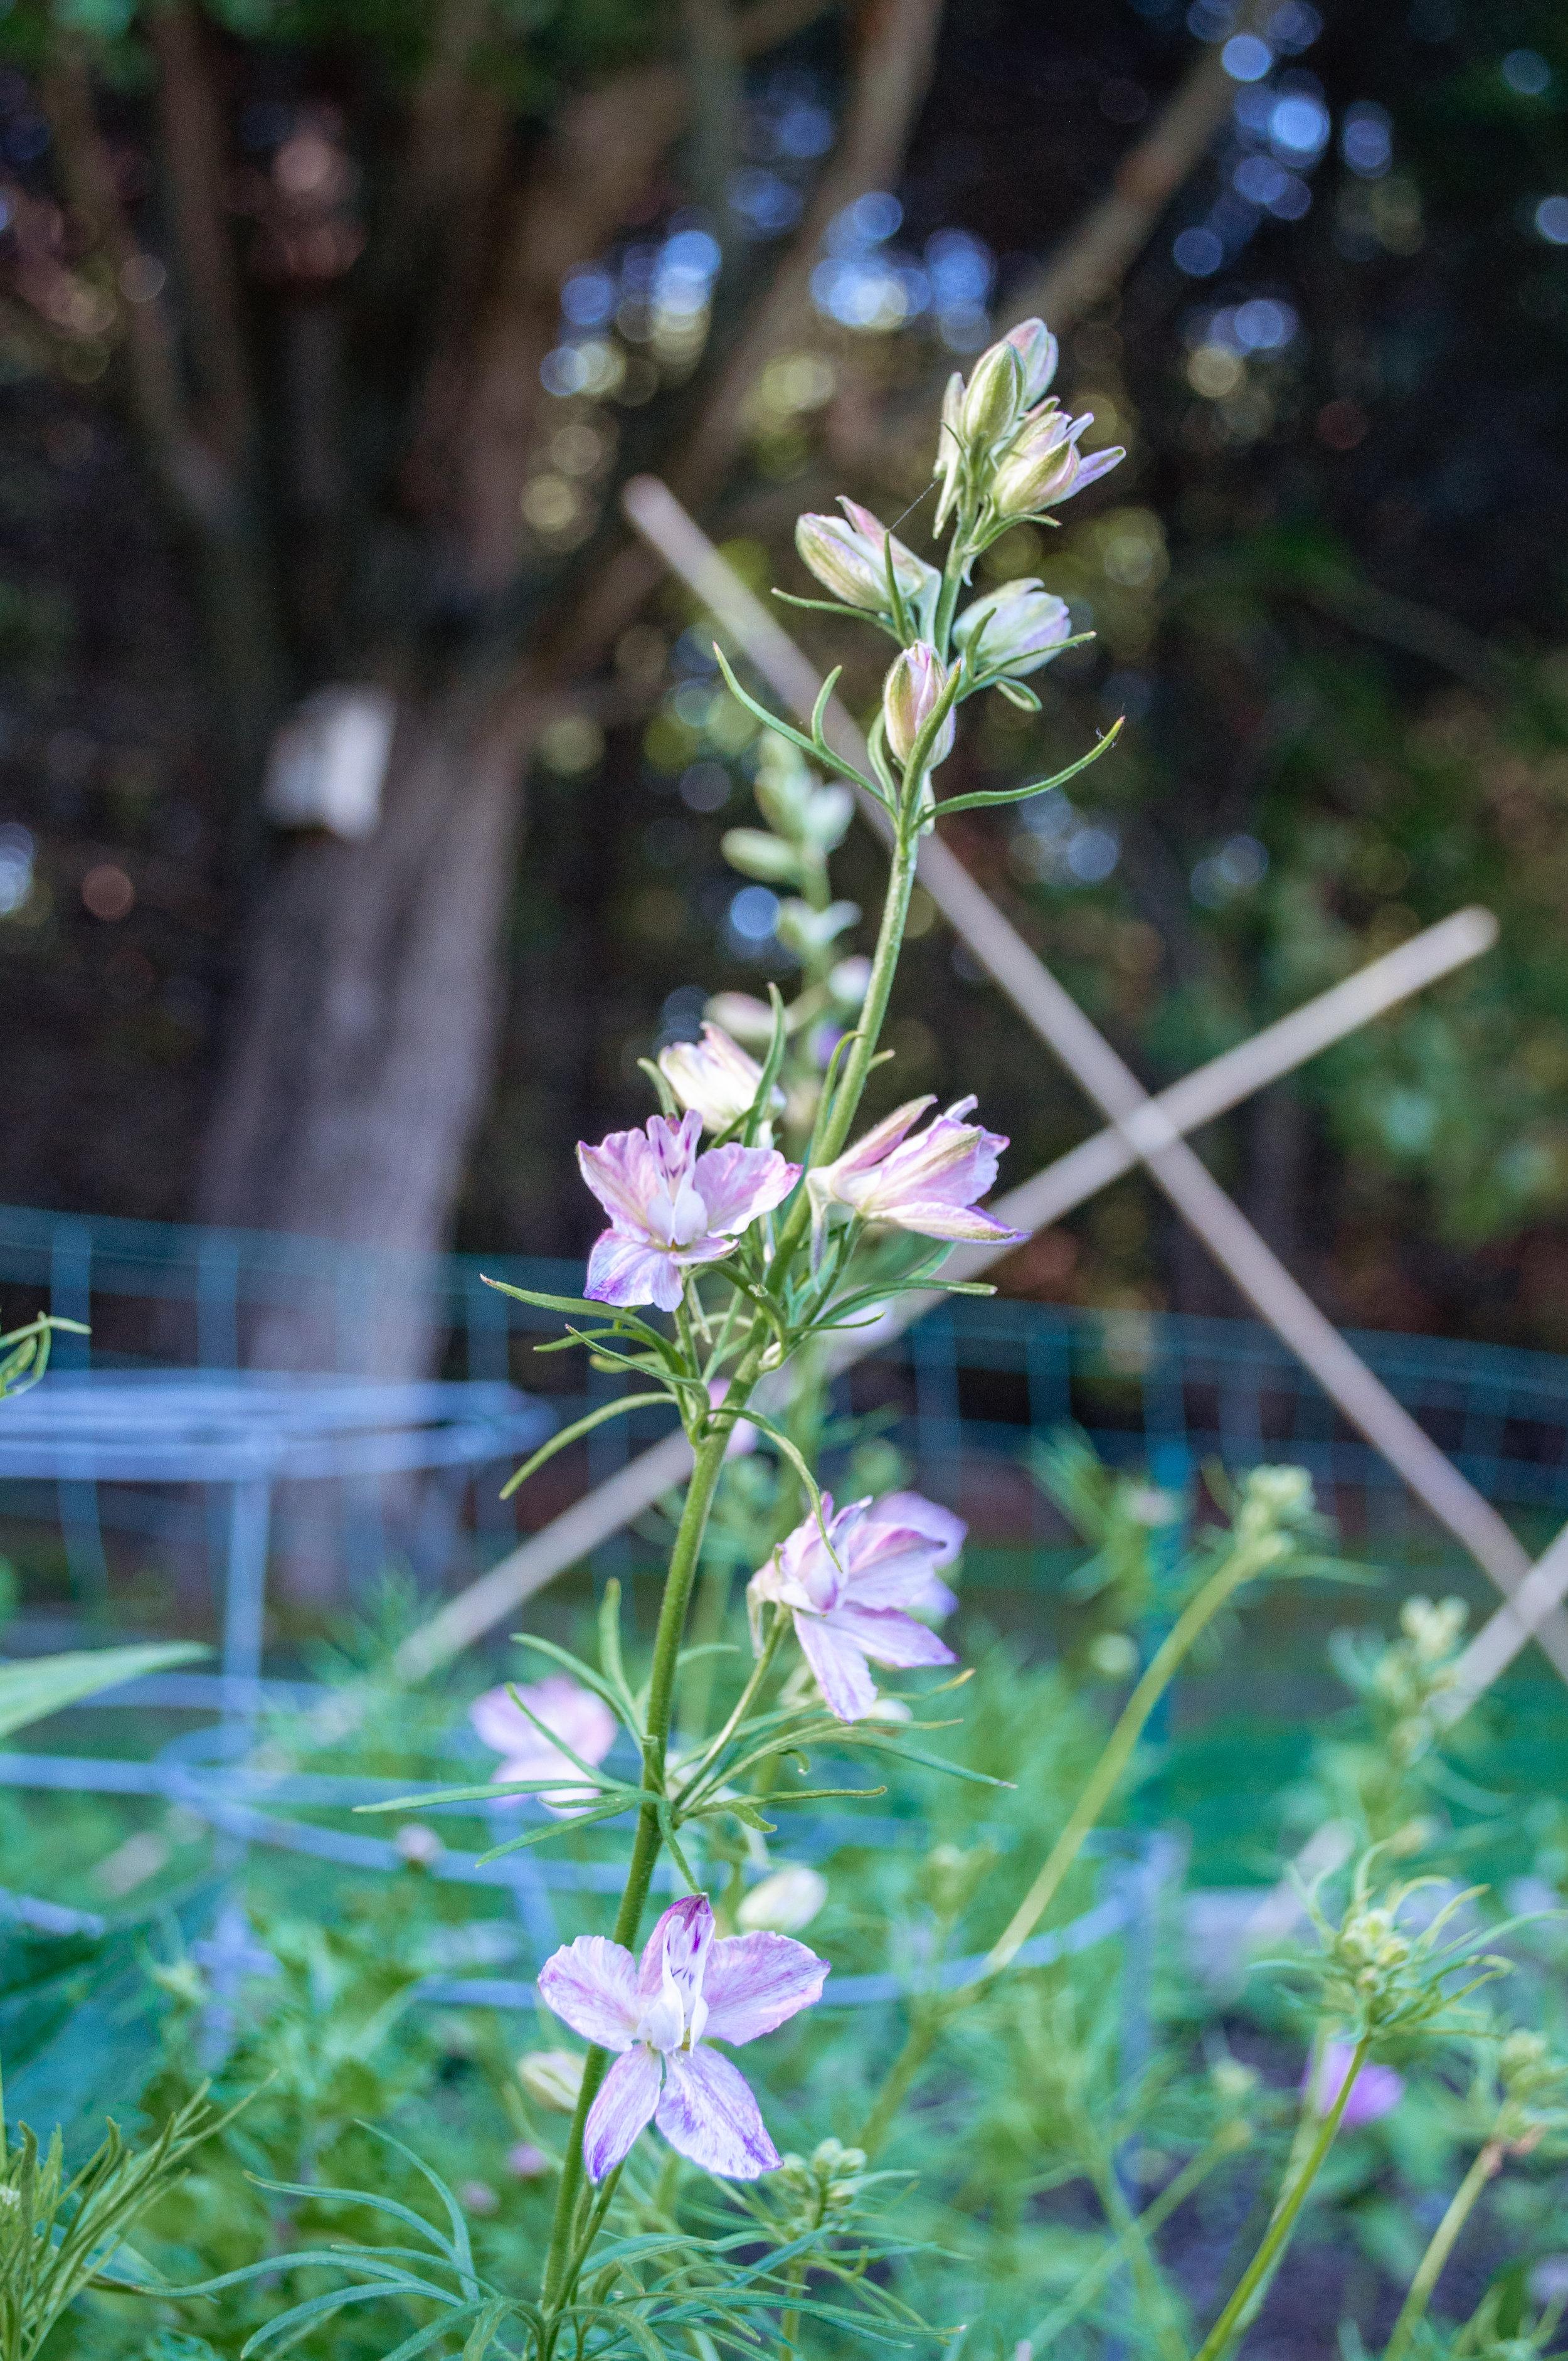 june15_garden2_larkspur-3.jpg